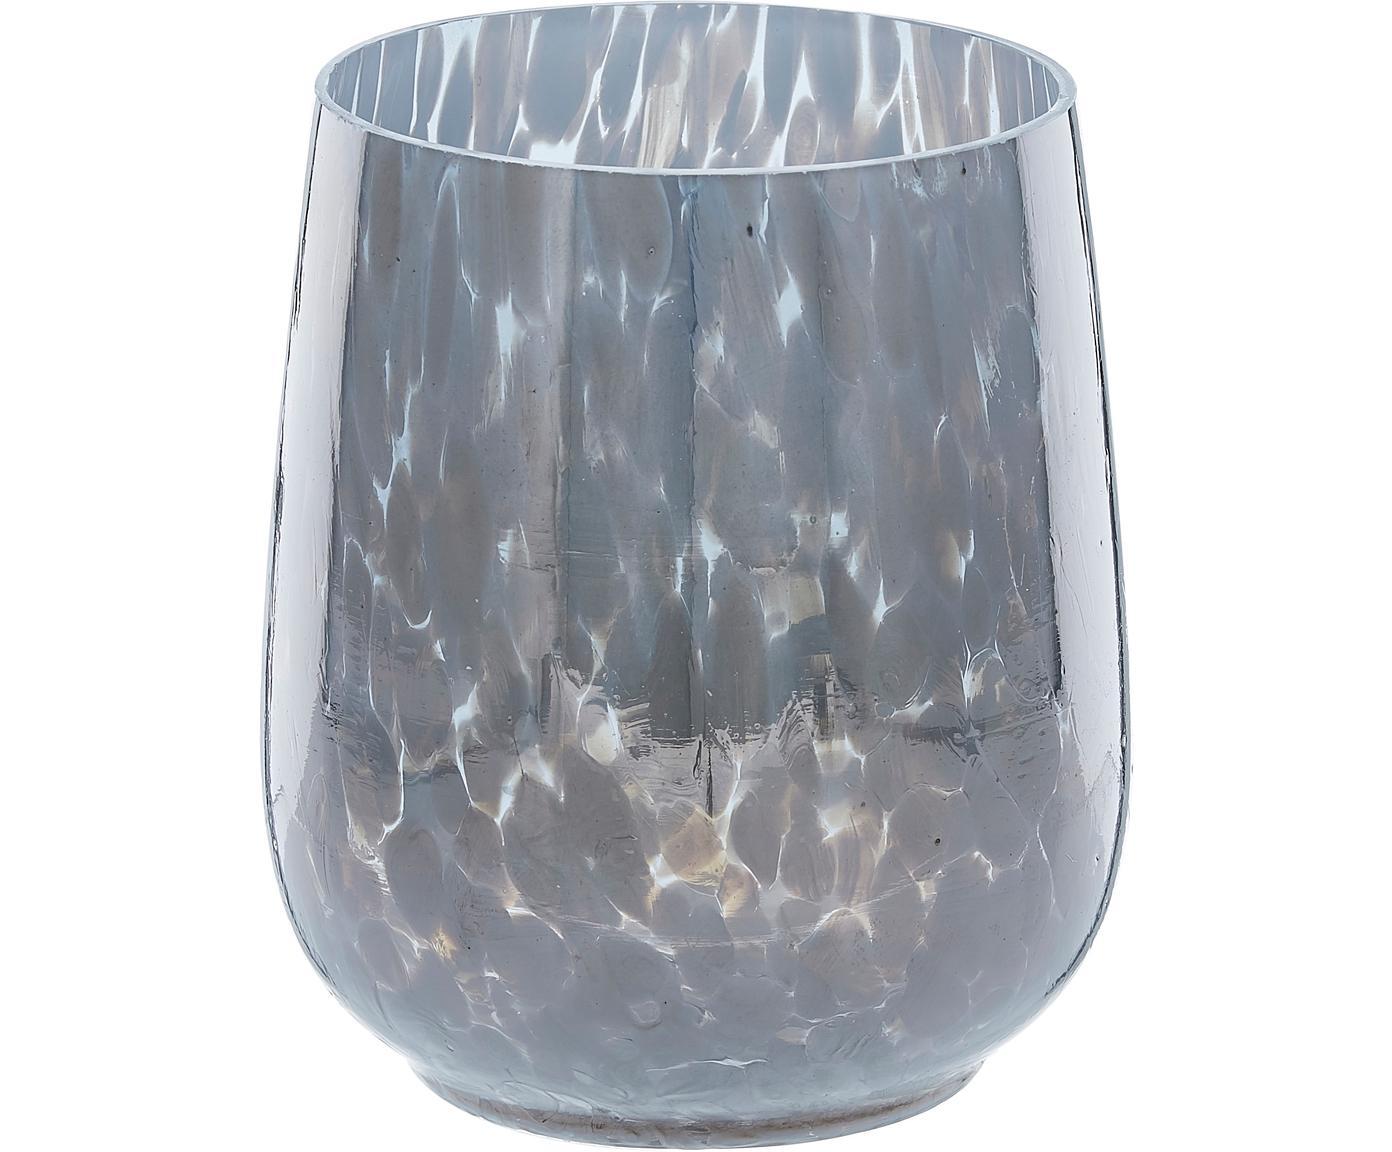 Portacandela in vetro Gunia, Vetro, Marrone scuro, Ø 10 x Alt. 12 cm